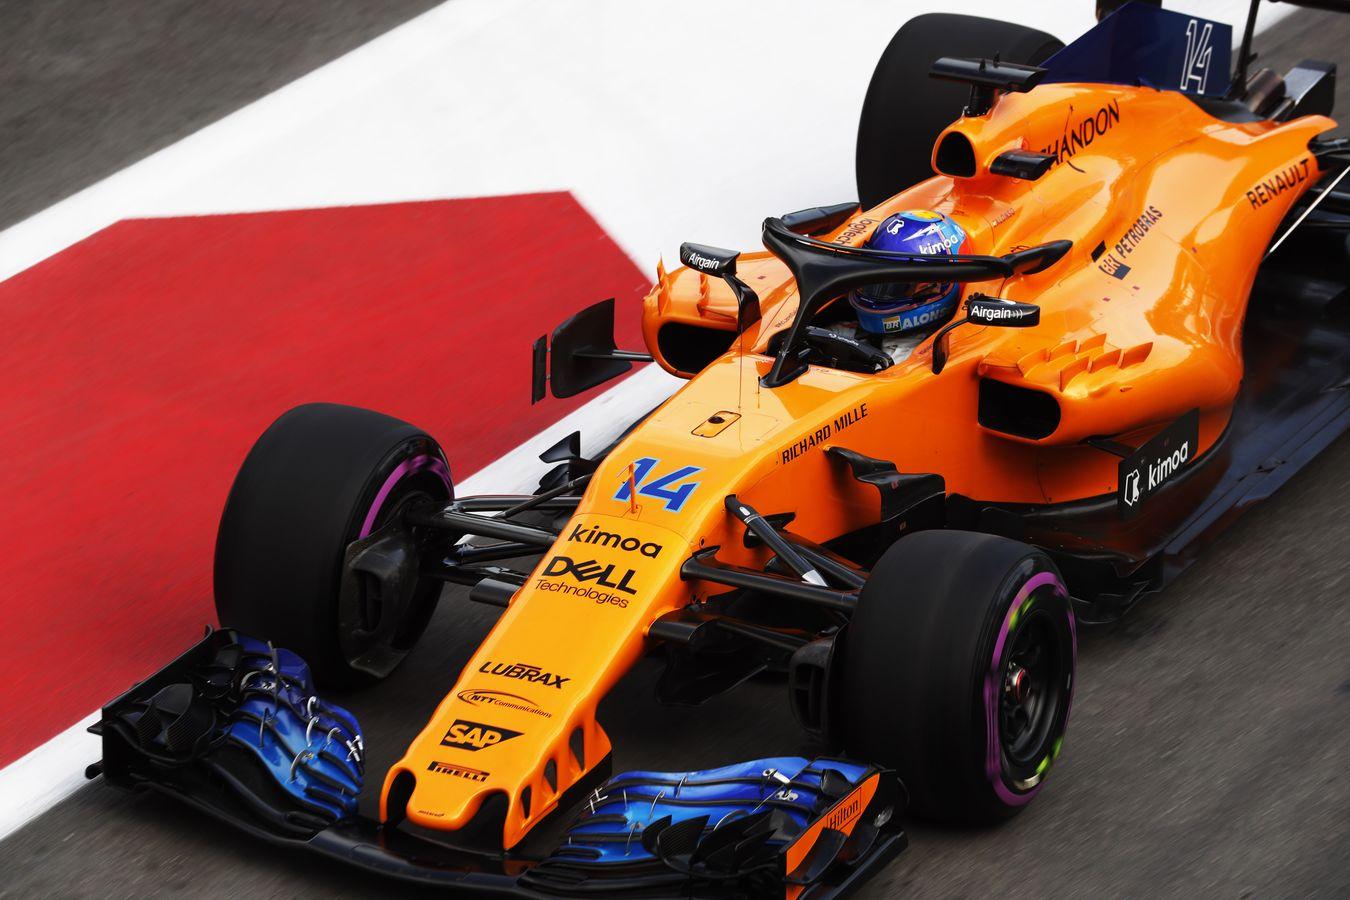 Mclaren Formula 1 2018 Azerbaijan Grand Prix Qualifying